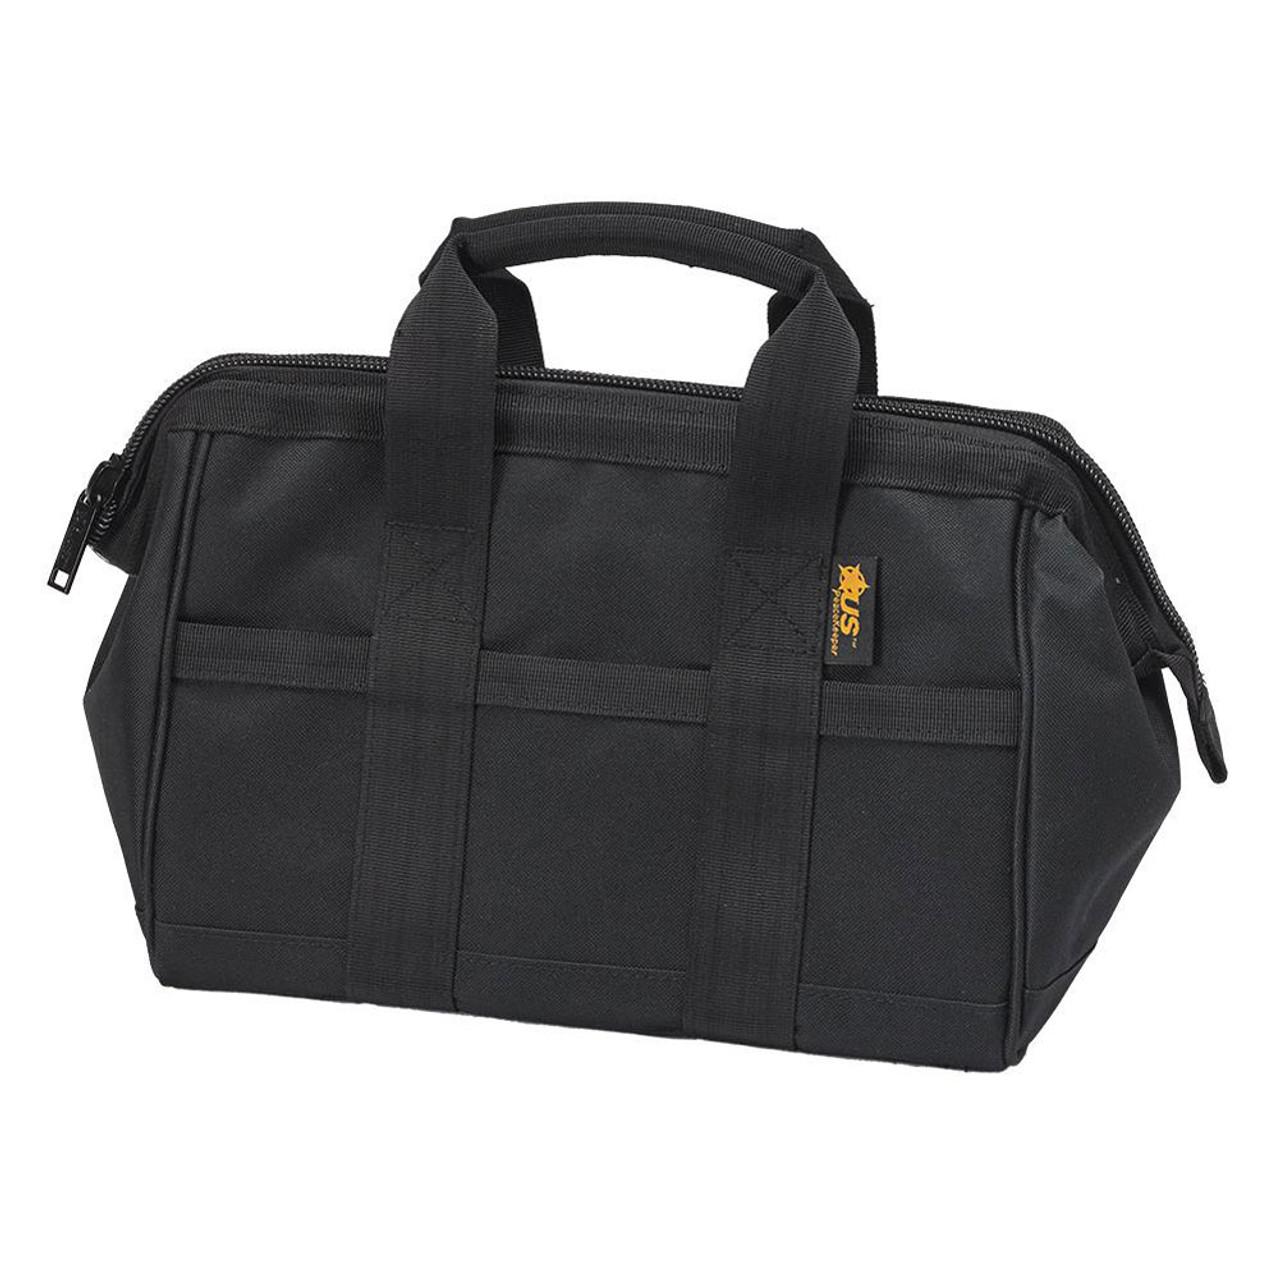 bdf1cc3e6e9e US PEACEKEEPER Black Ammo Bag (P23205) ...